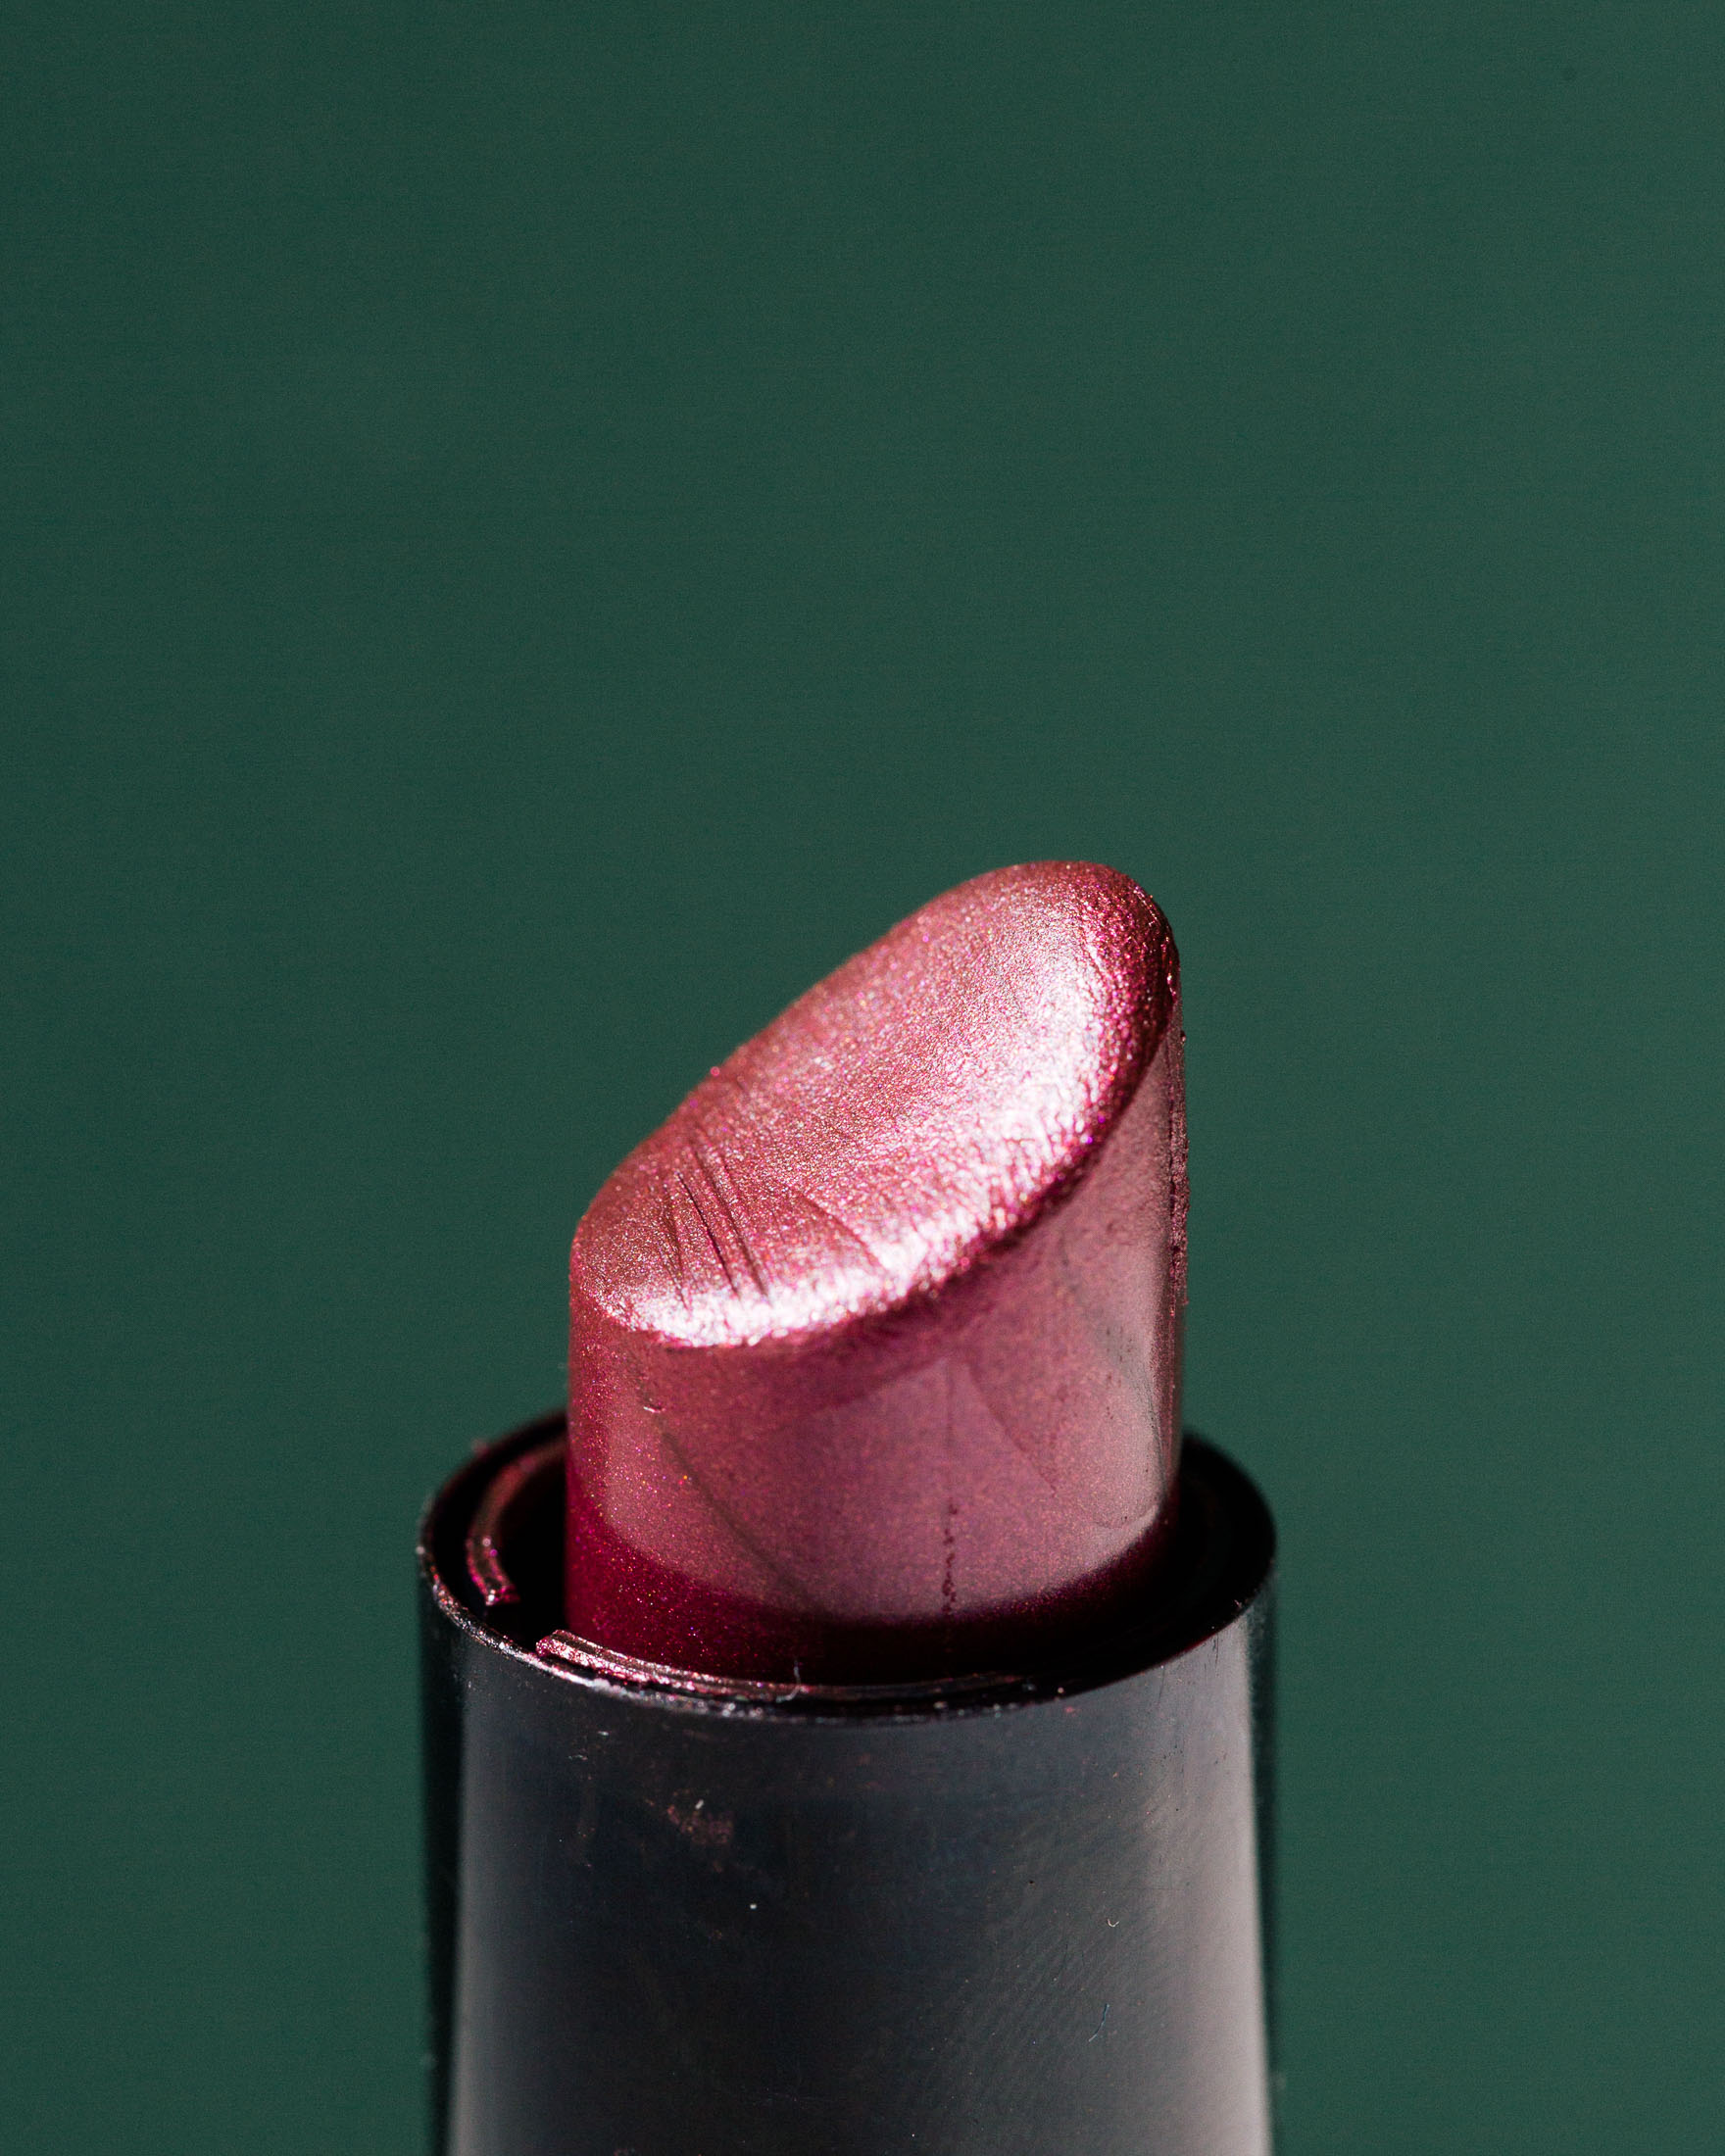 CMR-Lipsticks-8930.jpg